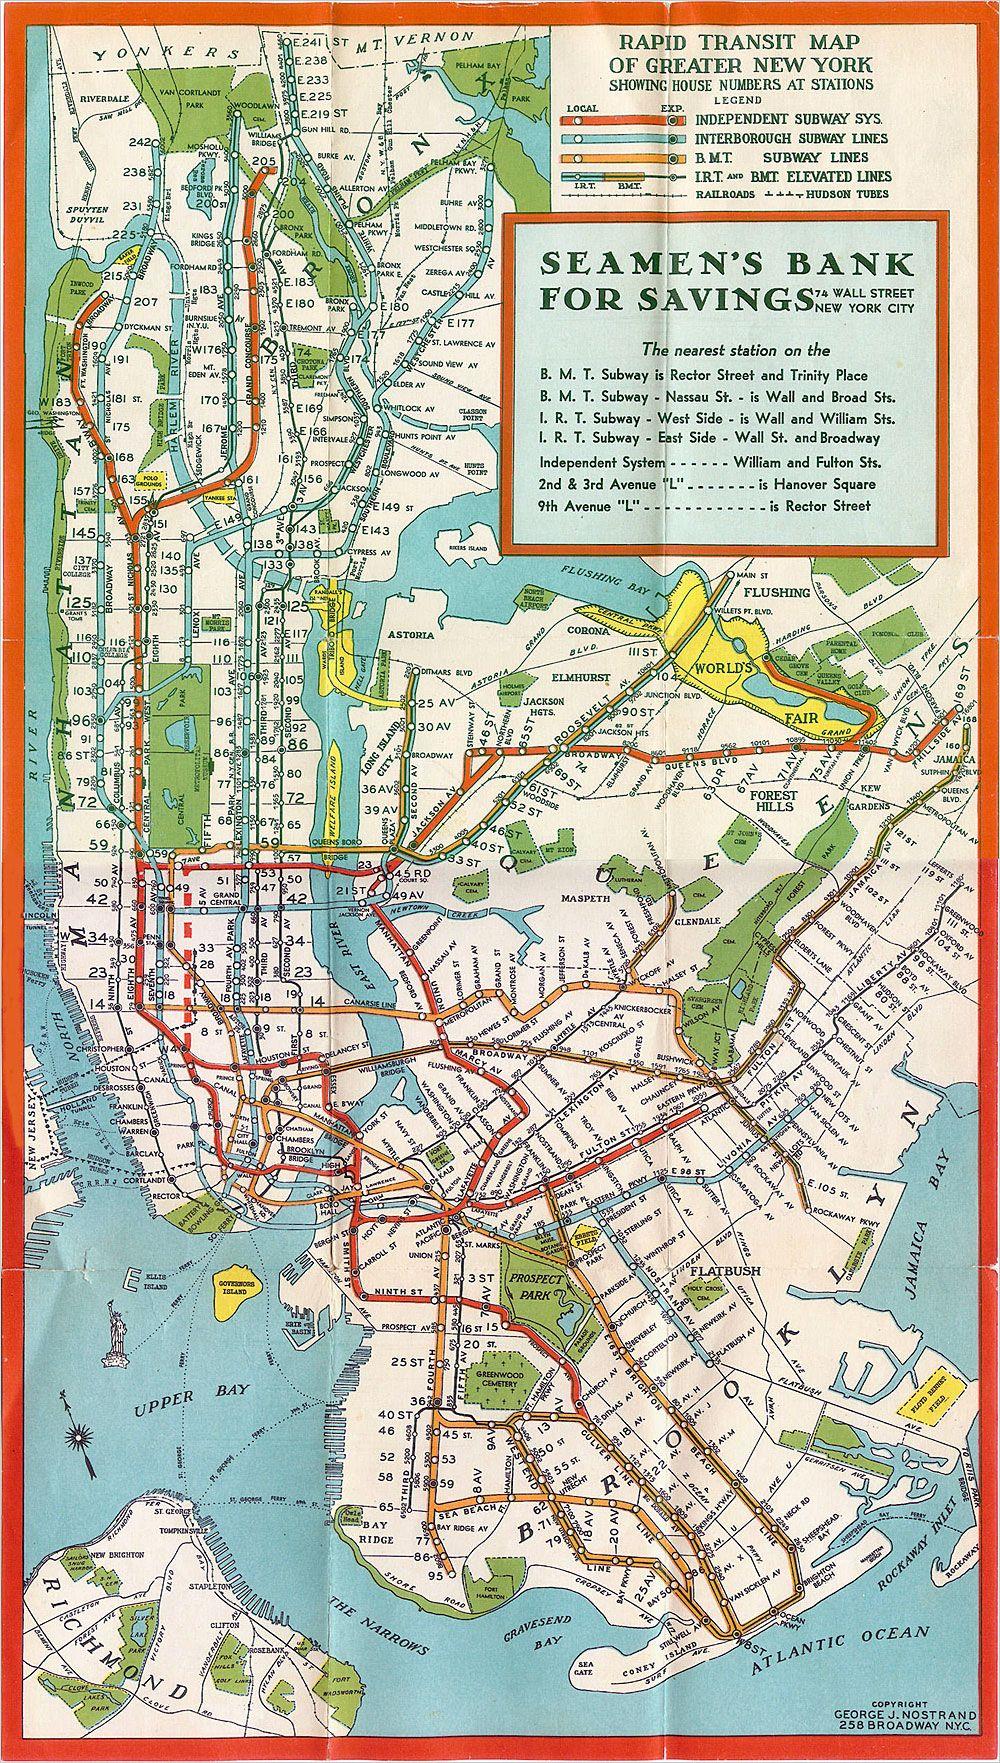 New York City Subway Map 1960s.New York City Subway Map Circa 1960 Ellie Stone S 1960s New York